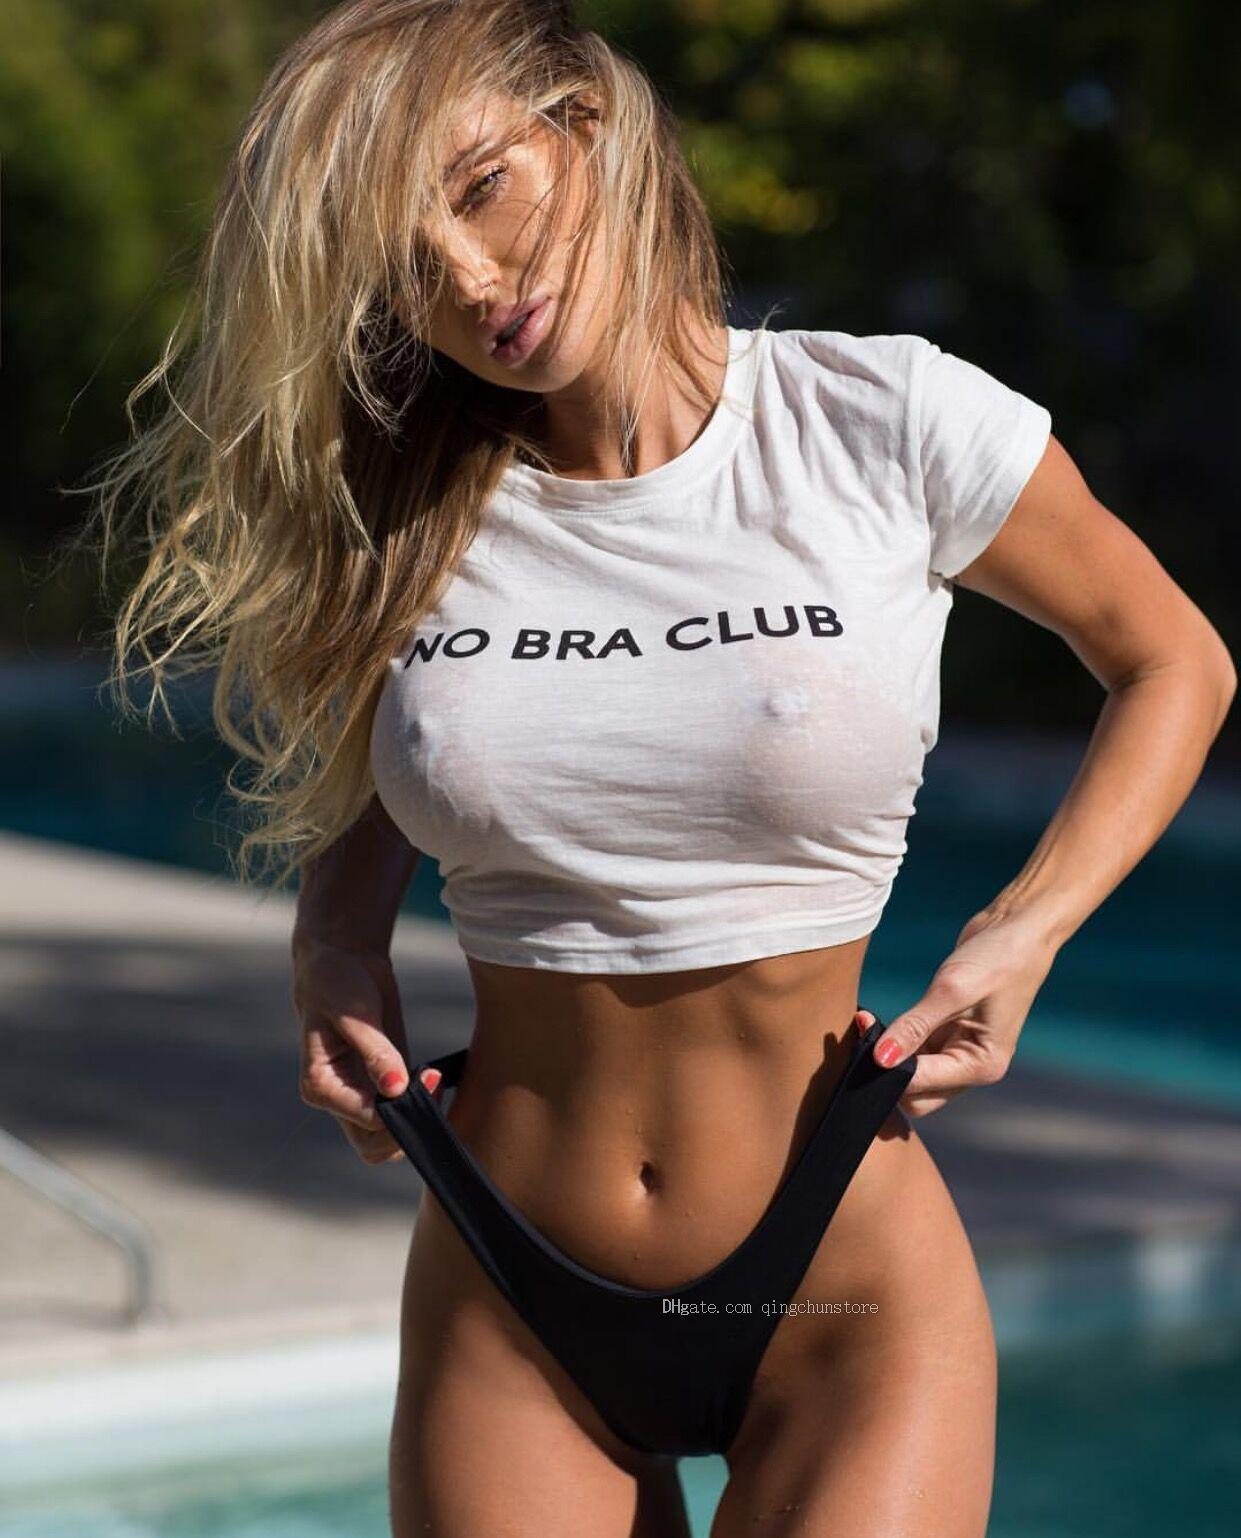 9eb8b82036e3a6 Fashion Sexy Crop Top No Bra Club Women Harajuku T Shirt White Cotton O  Neck Brief Sheer Short T Shirt Casual Street Tops T Shirts Sites Shirt Tees  From ...